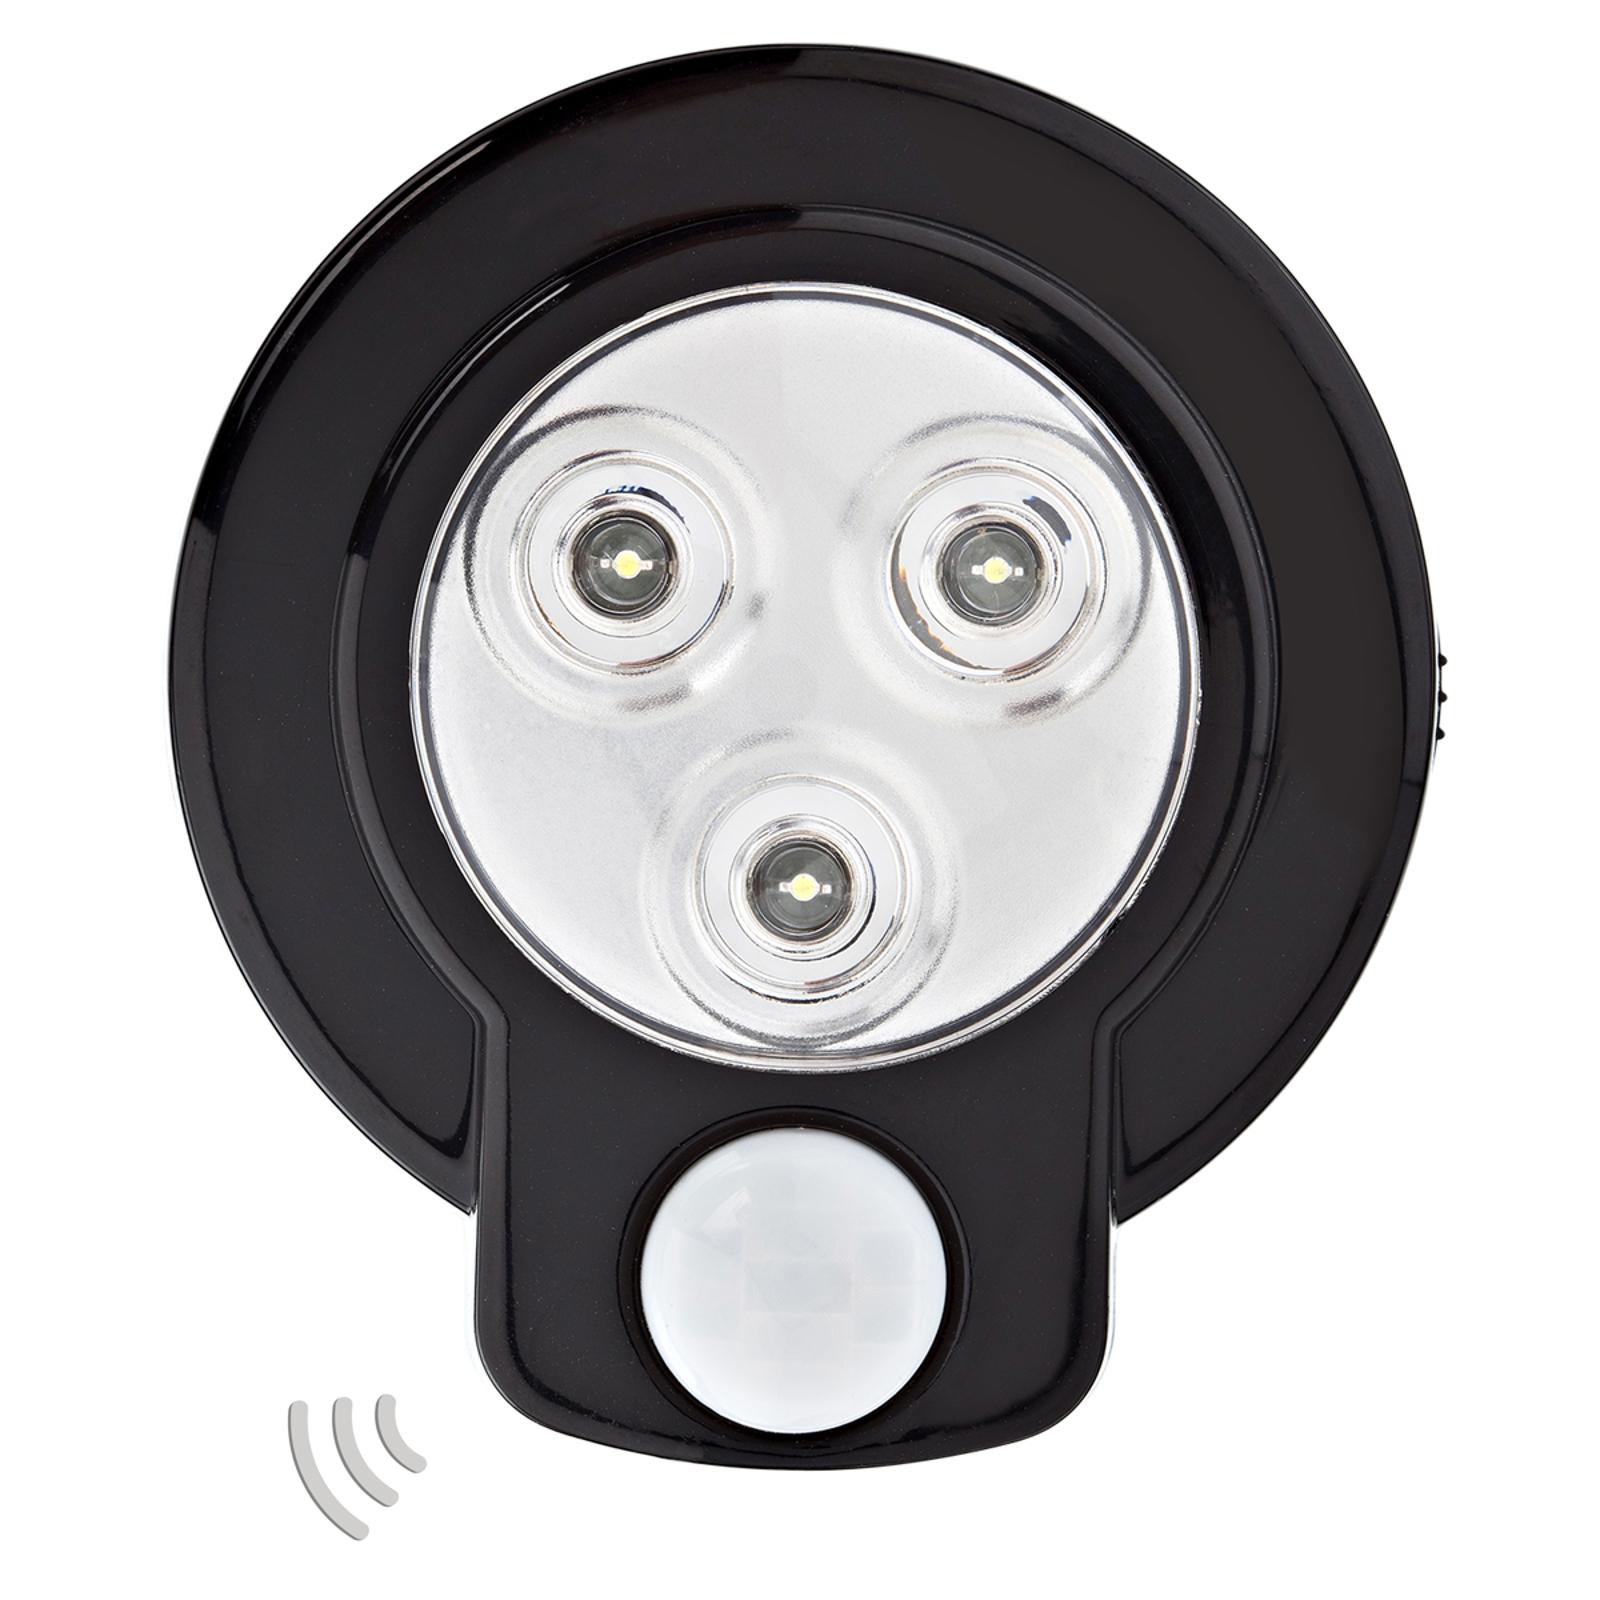 Nightlight Flex Sensor – yövalo, paristokäyttöinen